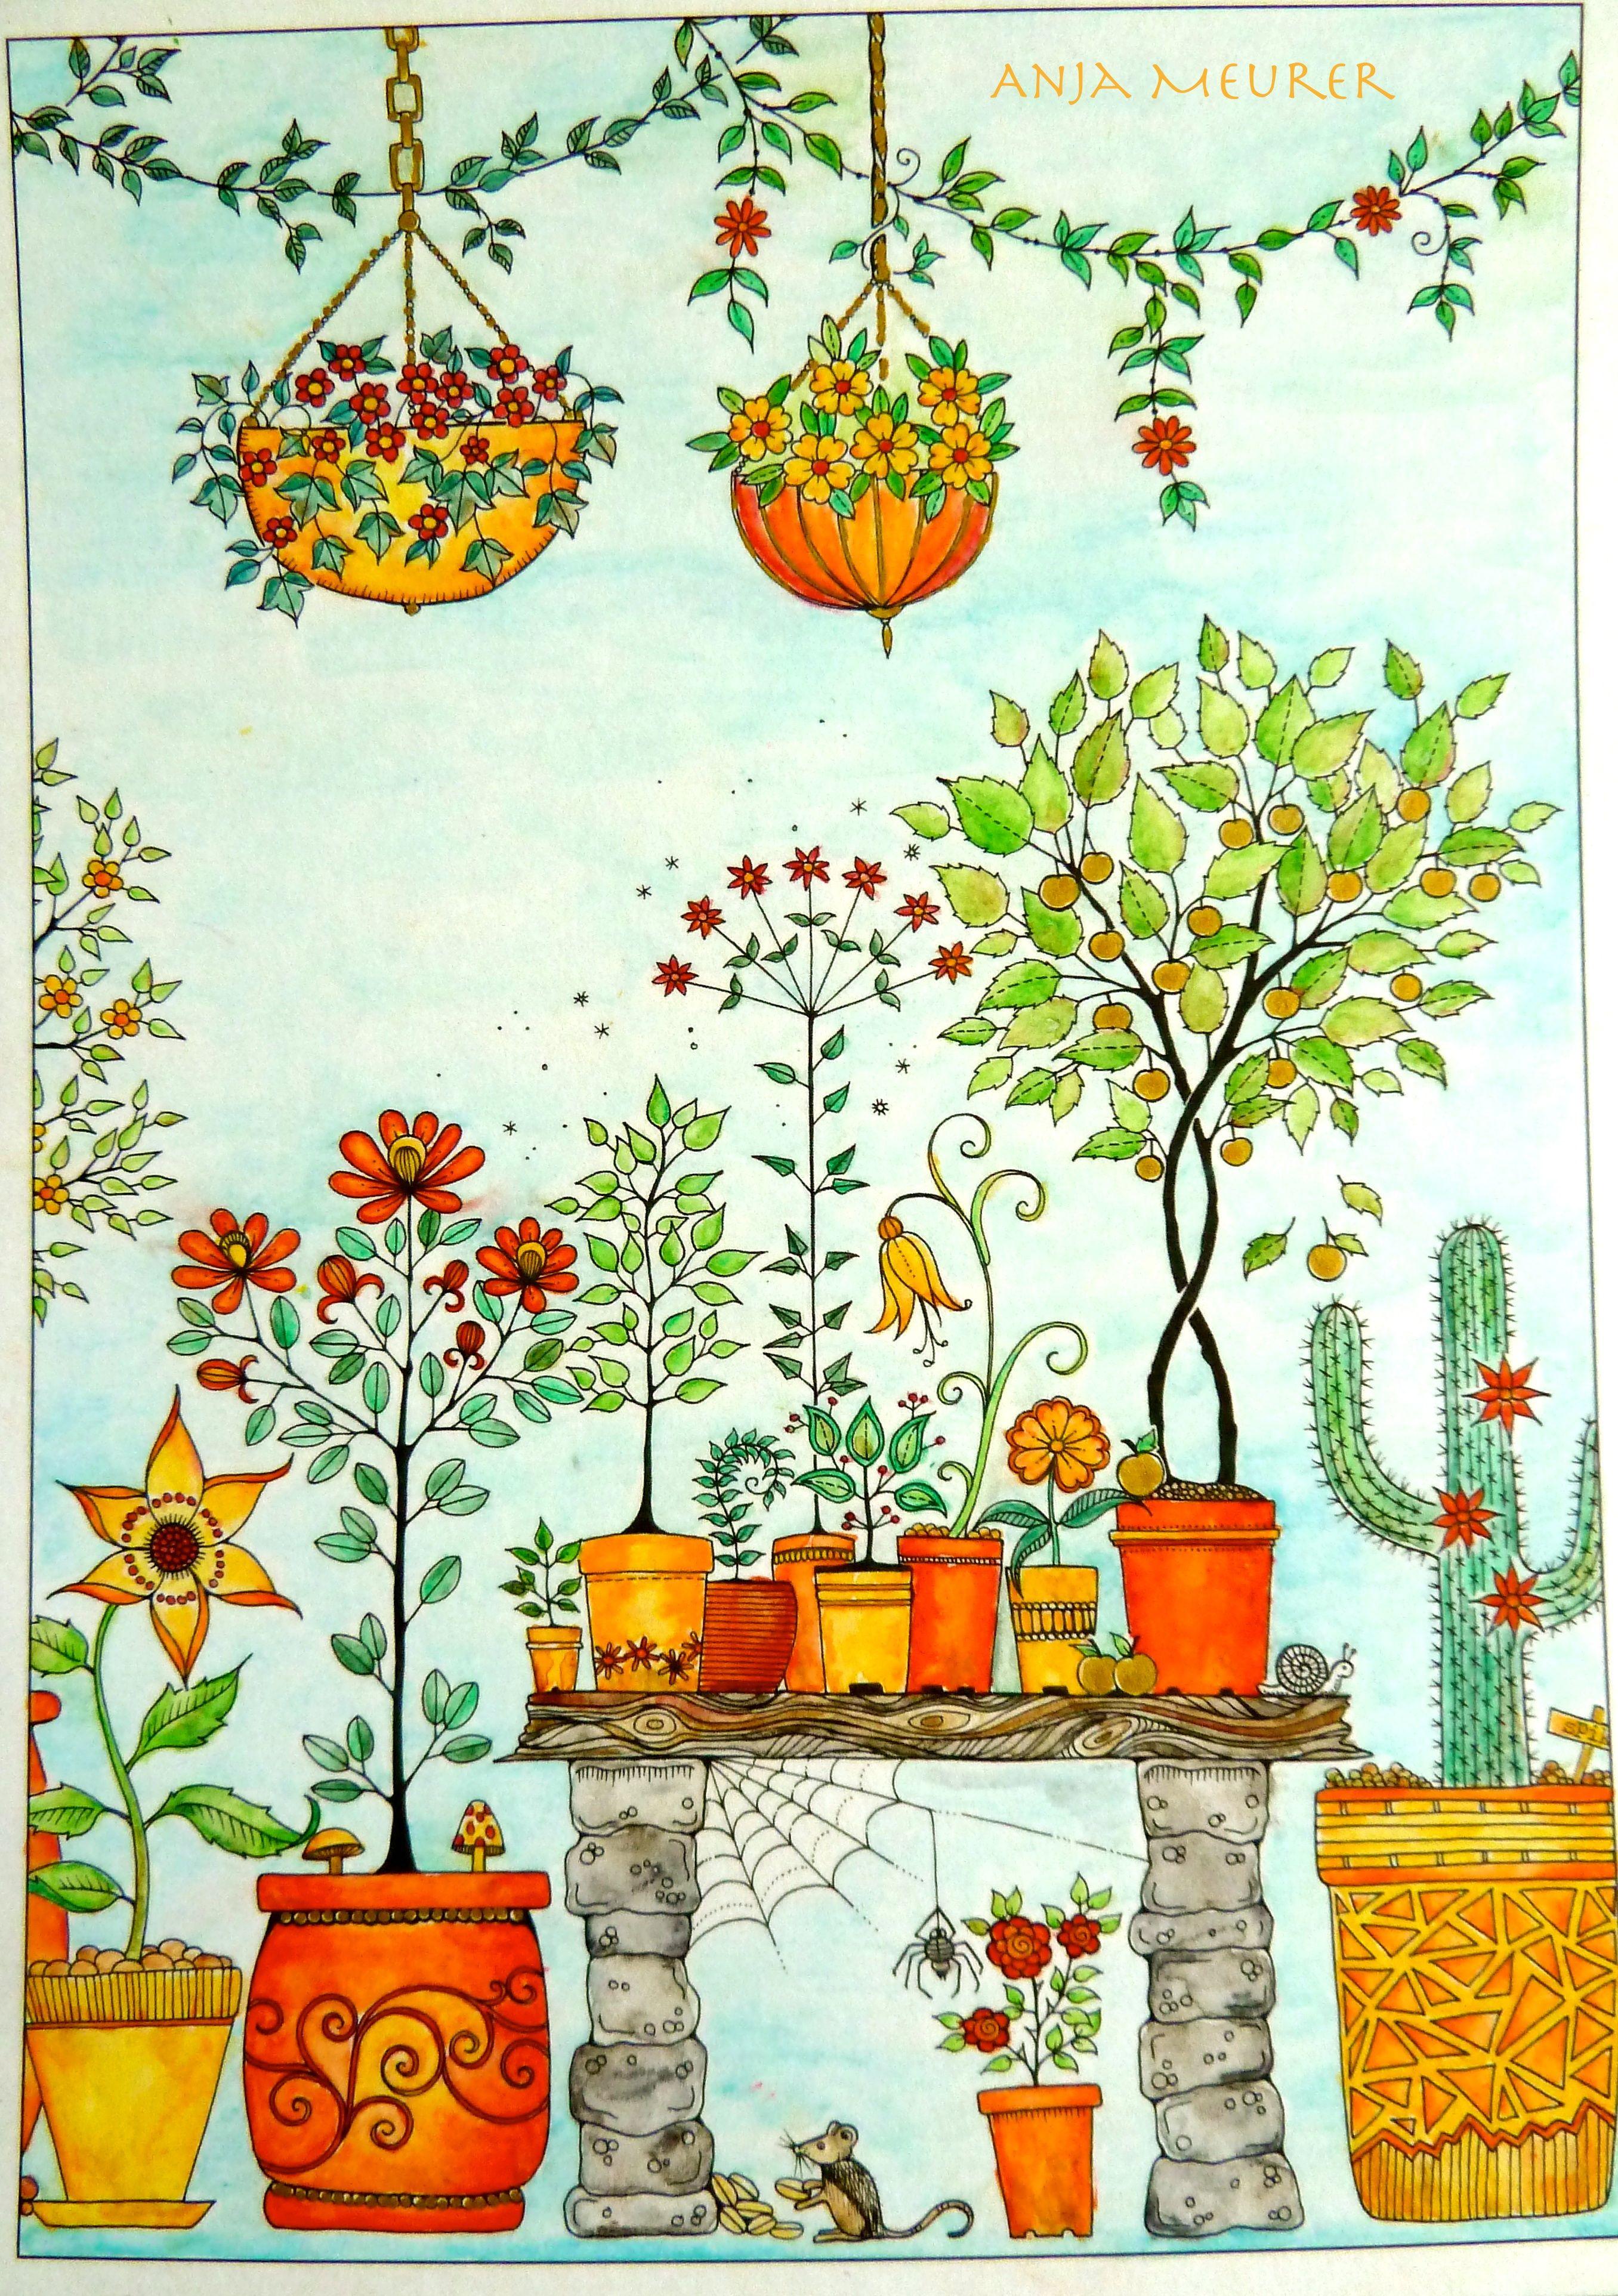 JOHANNA BASFORD Secret Garden Pfau 30,5/x 30,5/cm Farbe Ihre eigenen Leinwand